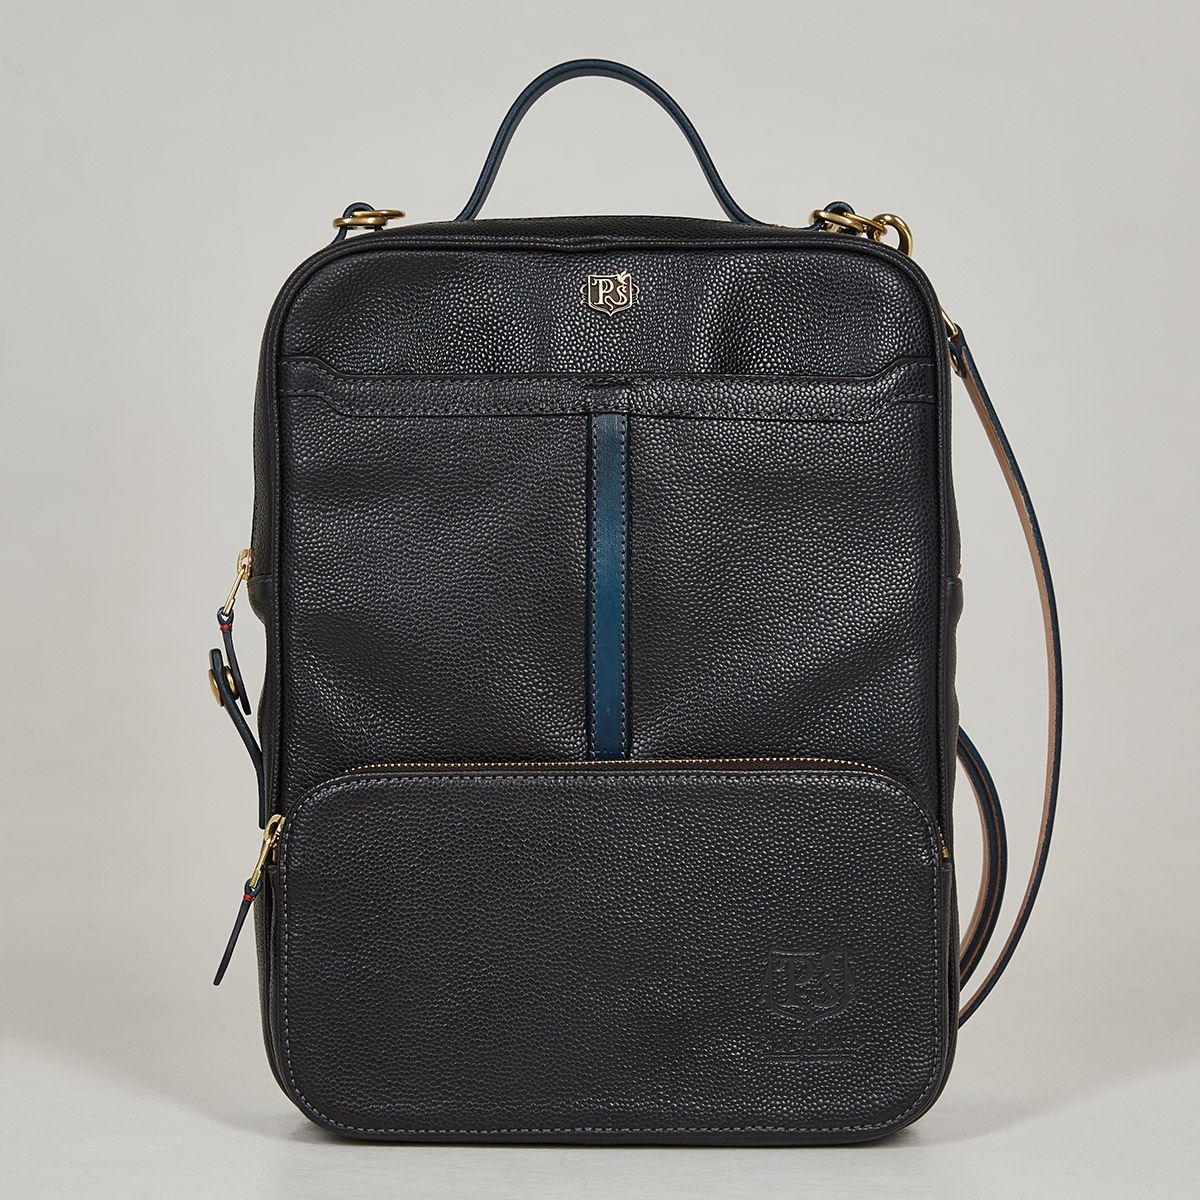 Crossbody bag-transformer CHELSEA sapphire blue & grain black